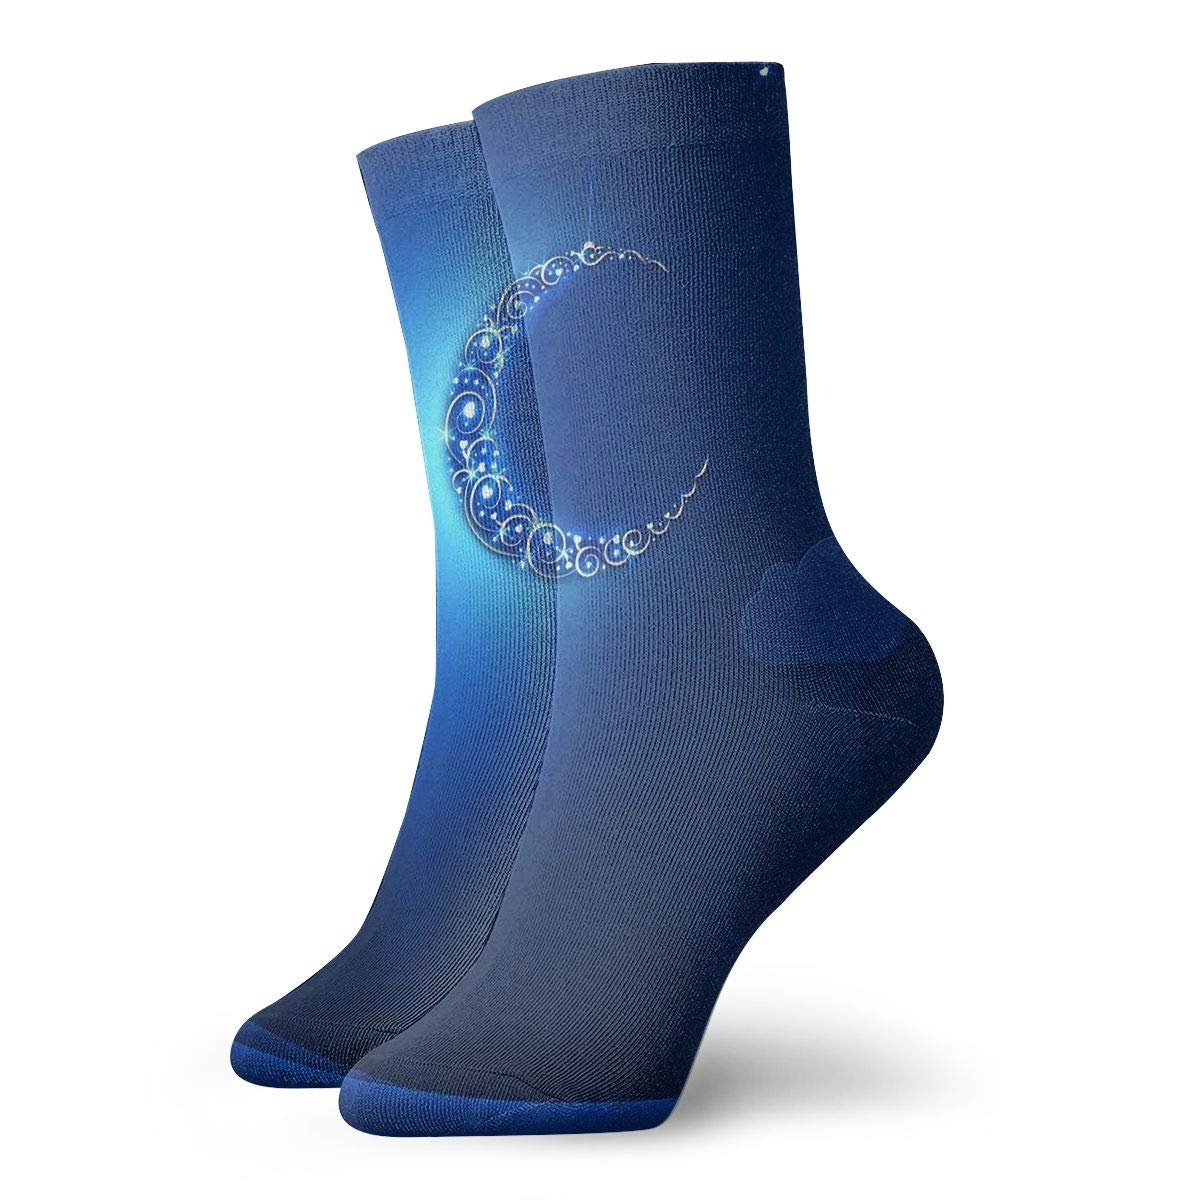 Unisex High Ankle Cushion Crew Socks Crescent Moon Casual Sport Socks